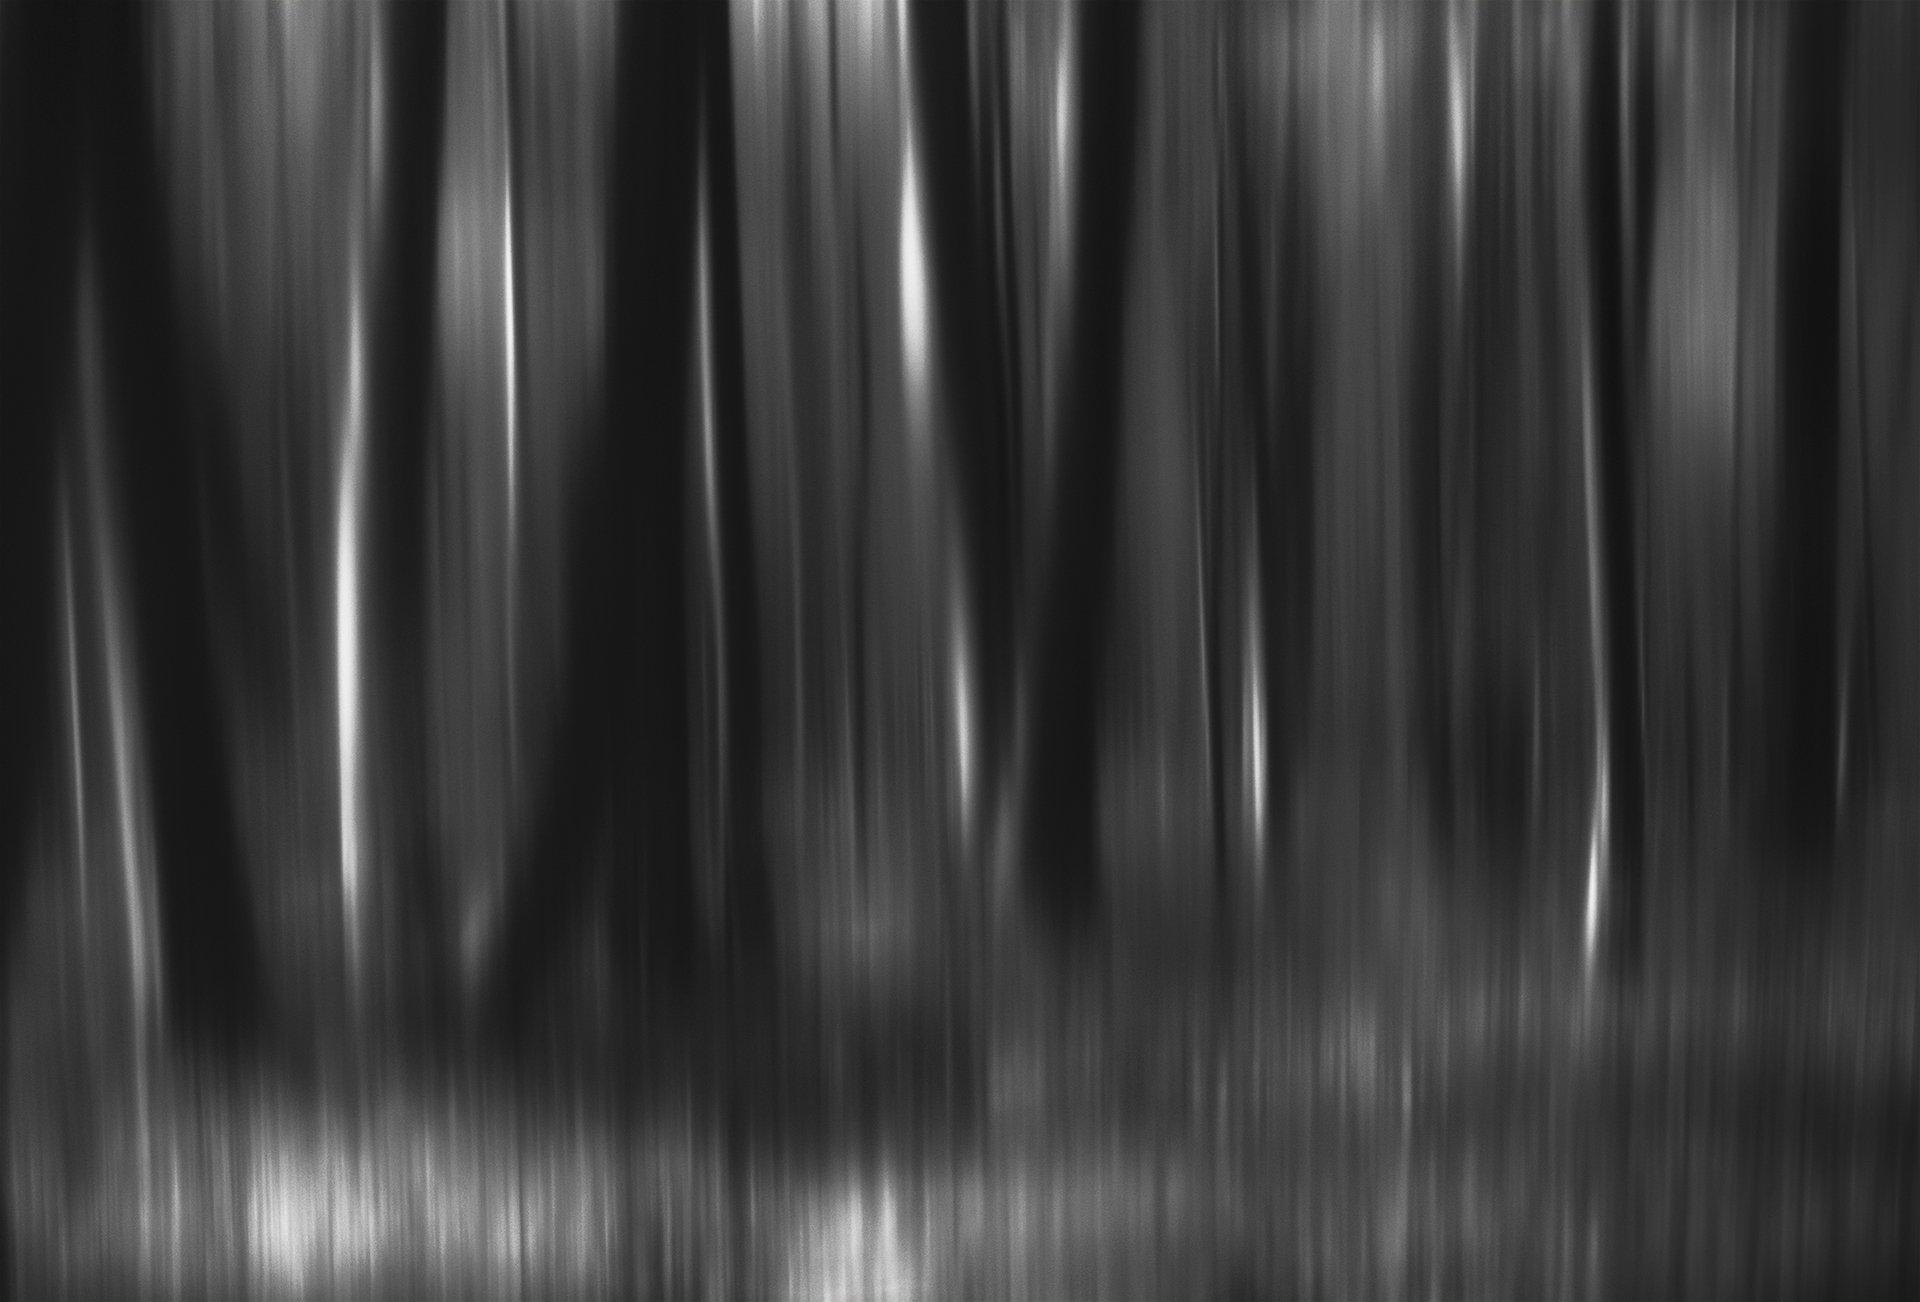 лес, арт, черно-белая фотография, чб, Olga  Wolkova